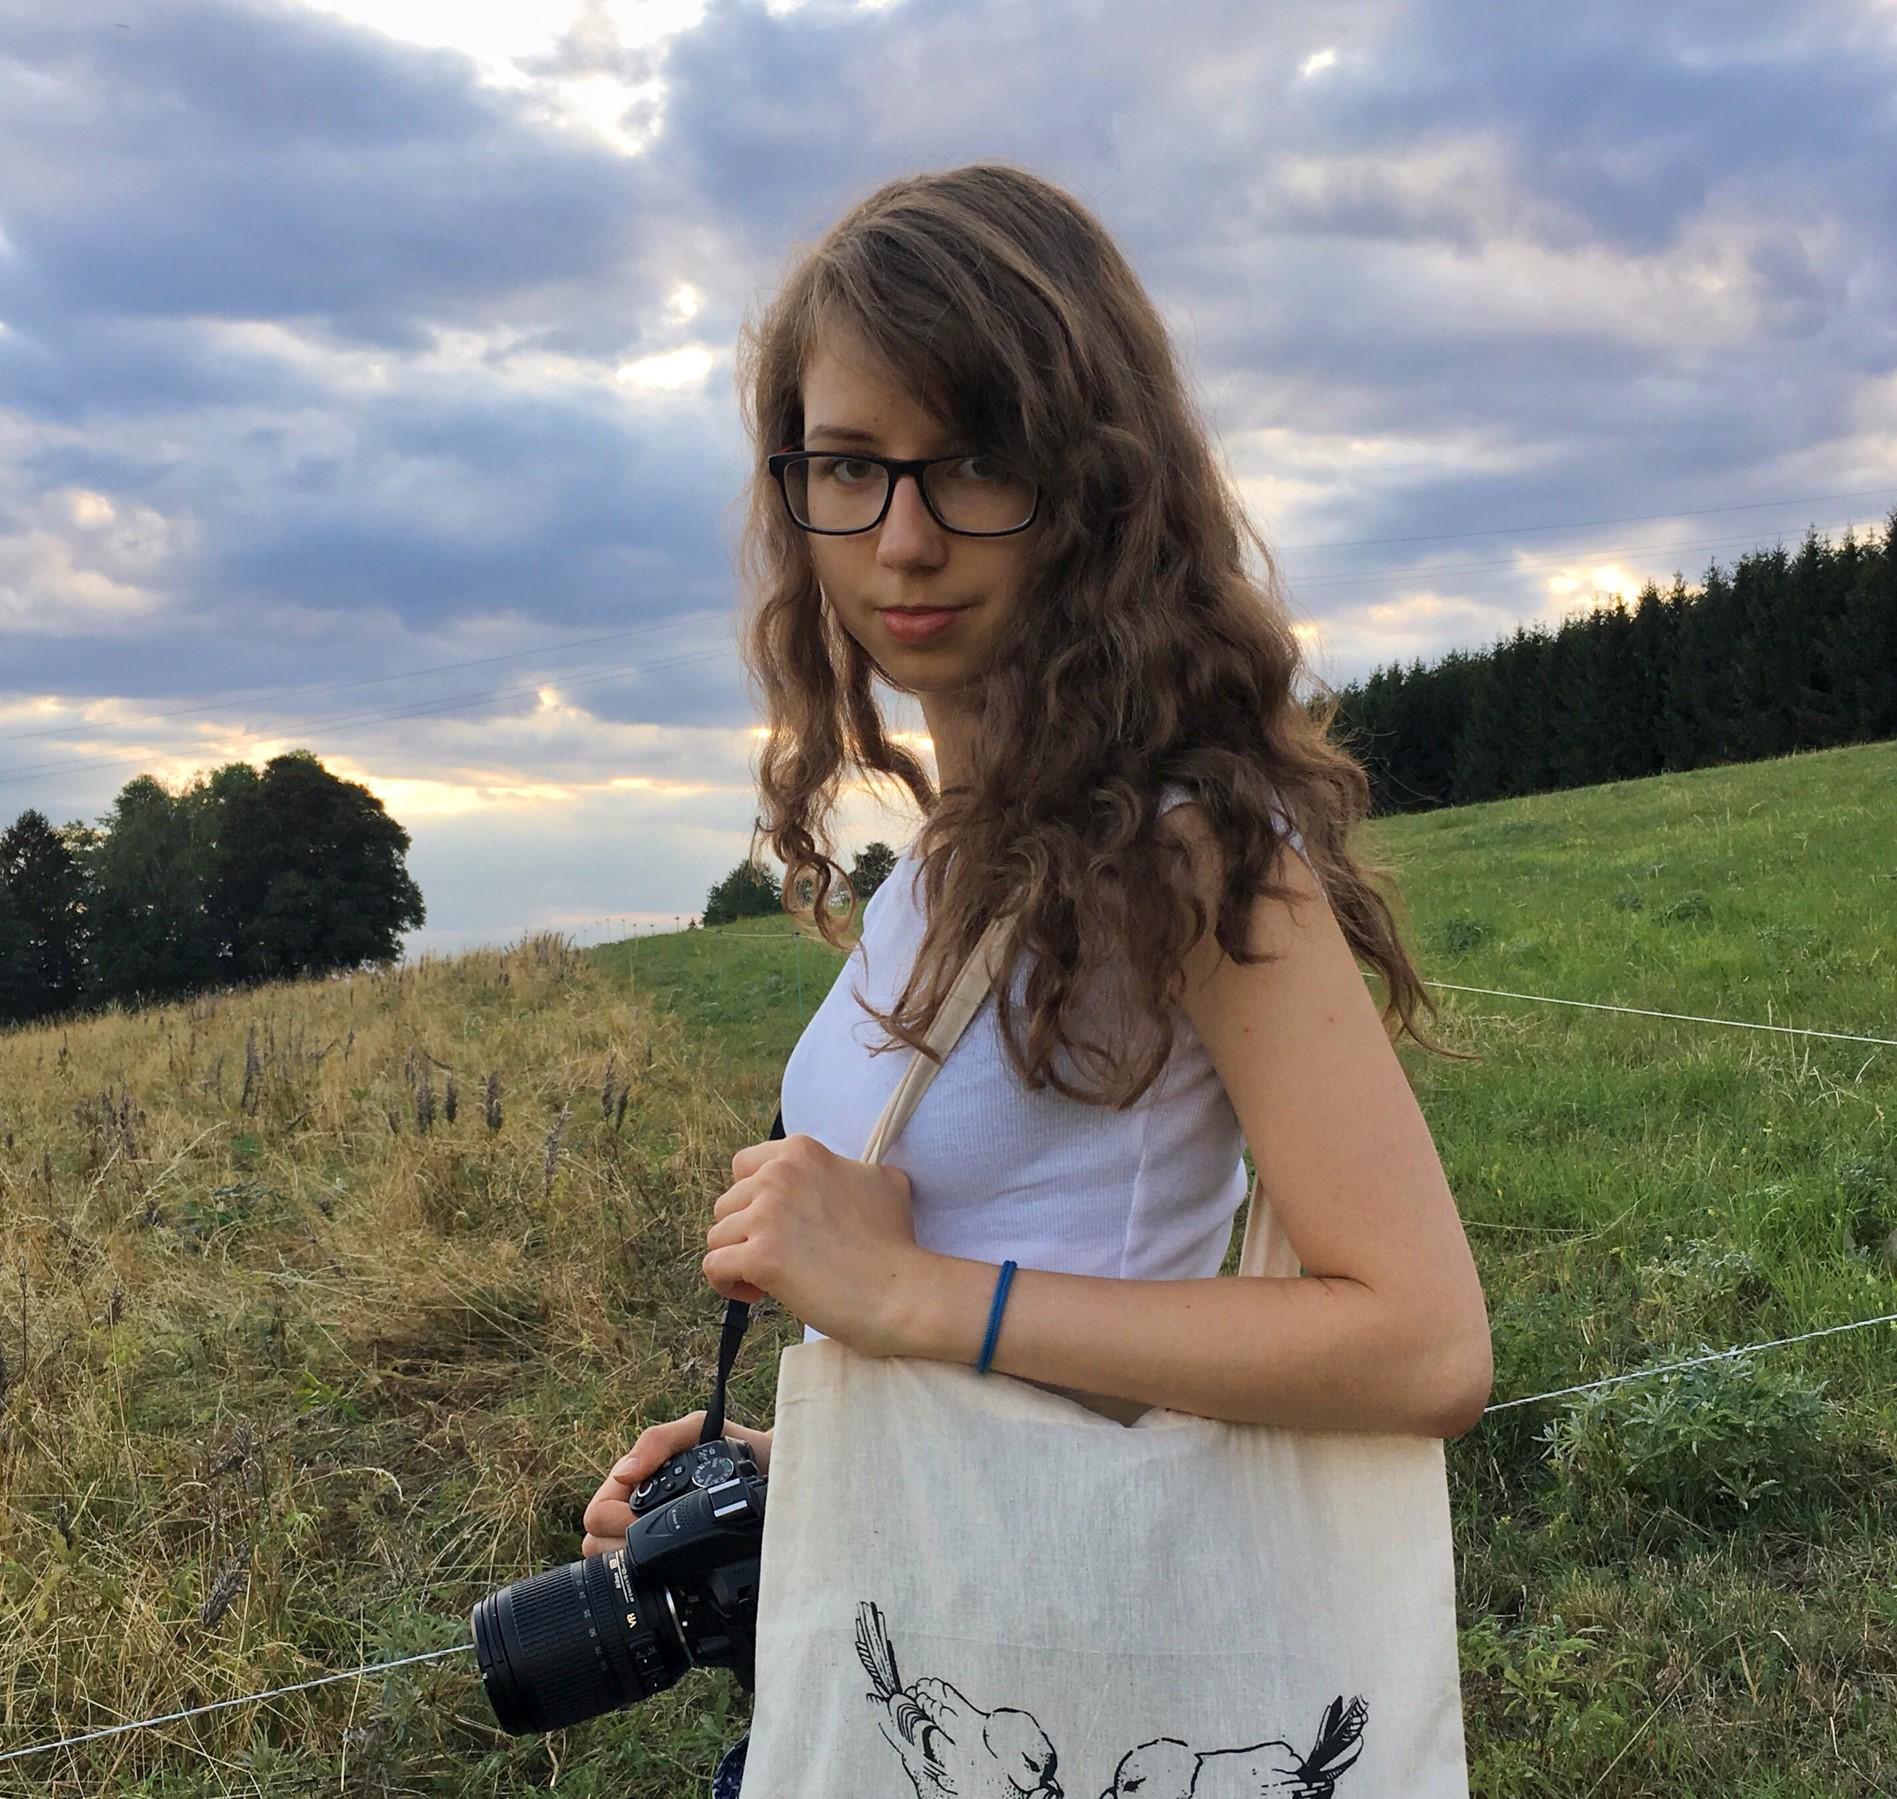 fotografie studenta Rejsková Alena